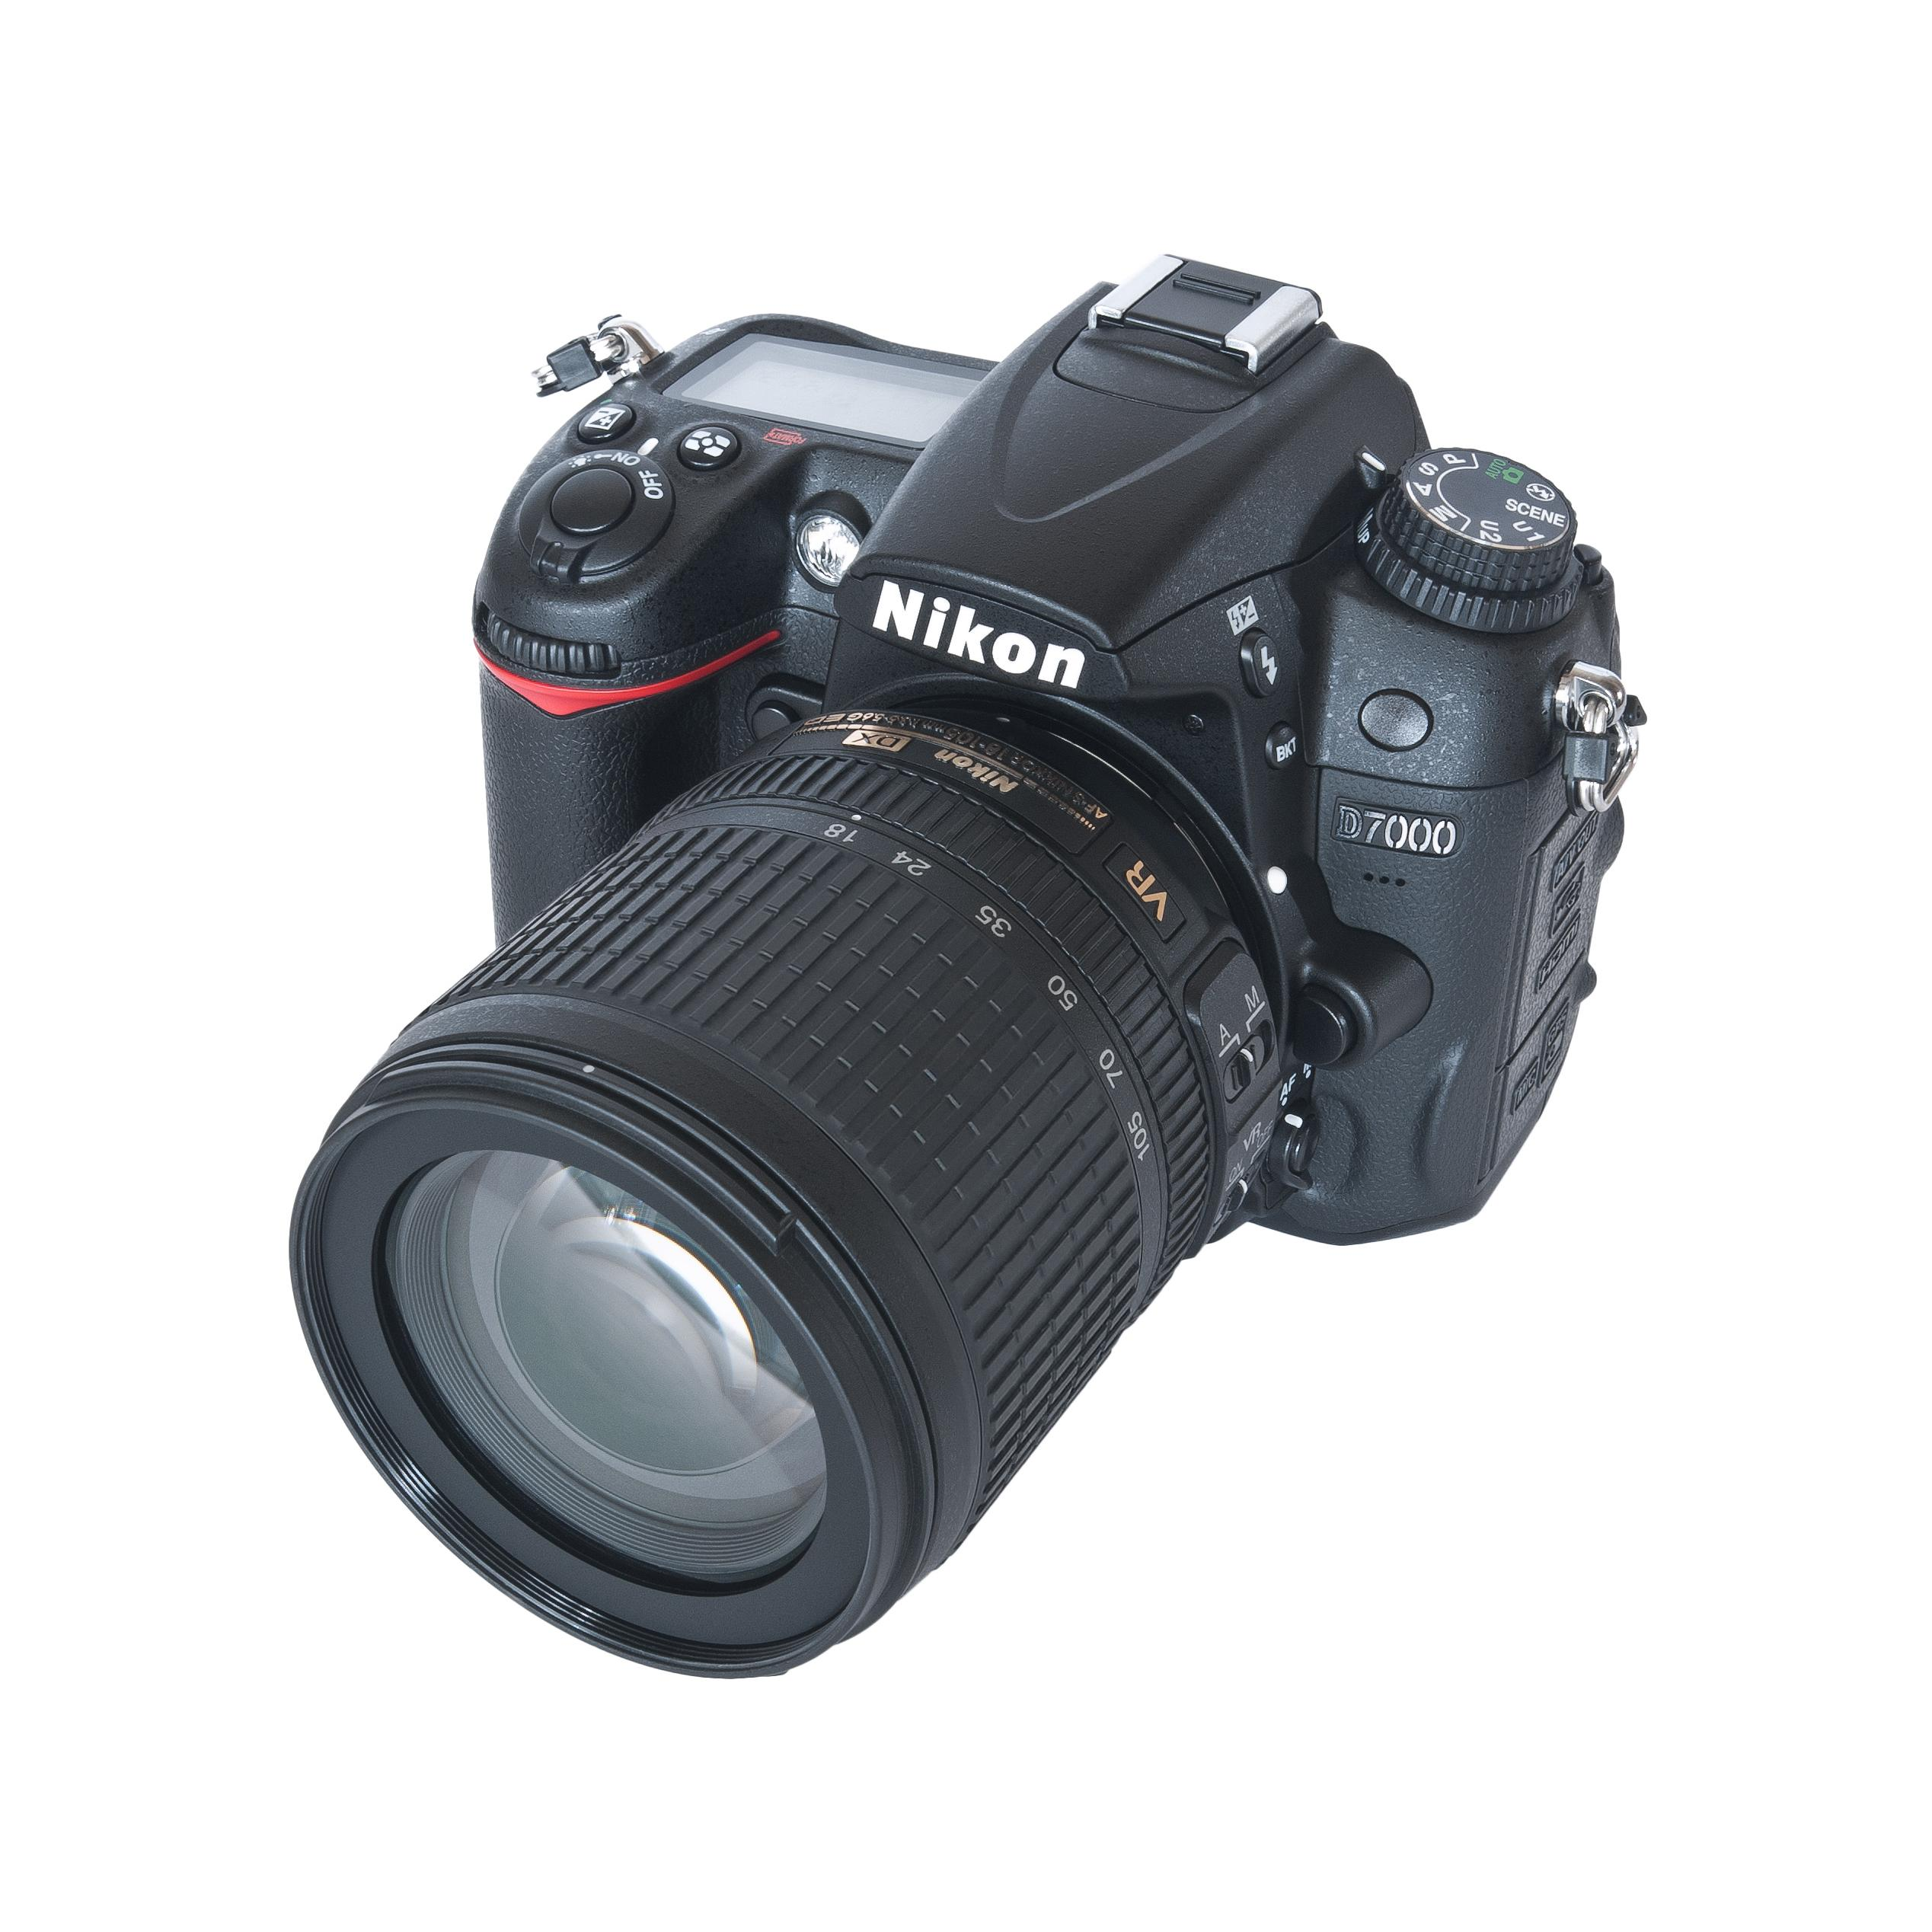 Reflex - NIKON D7000 - NIKKOR 18-105mm